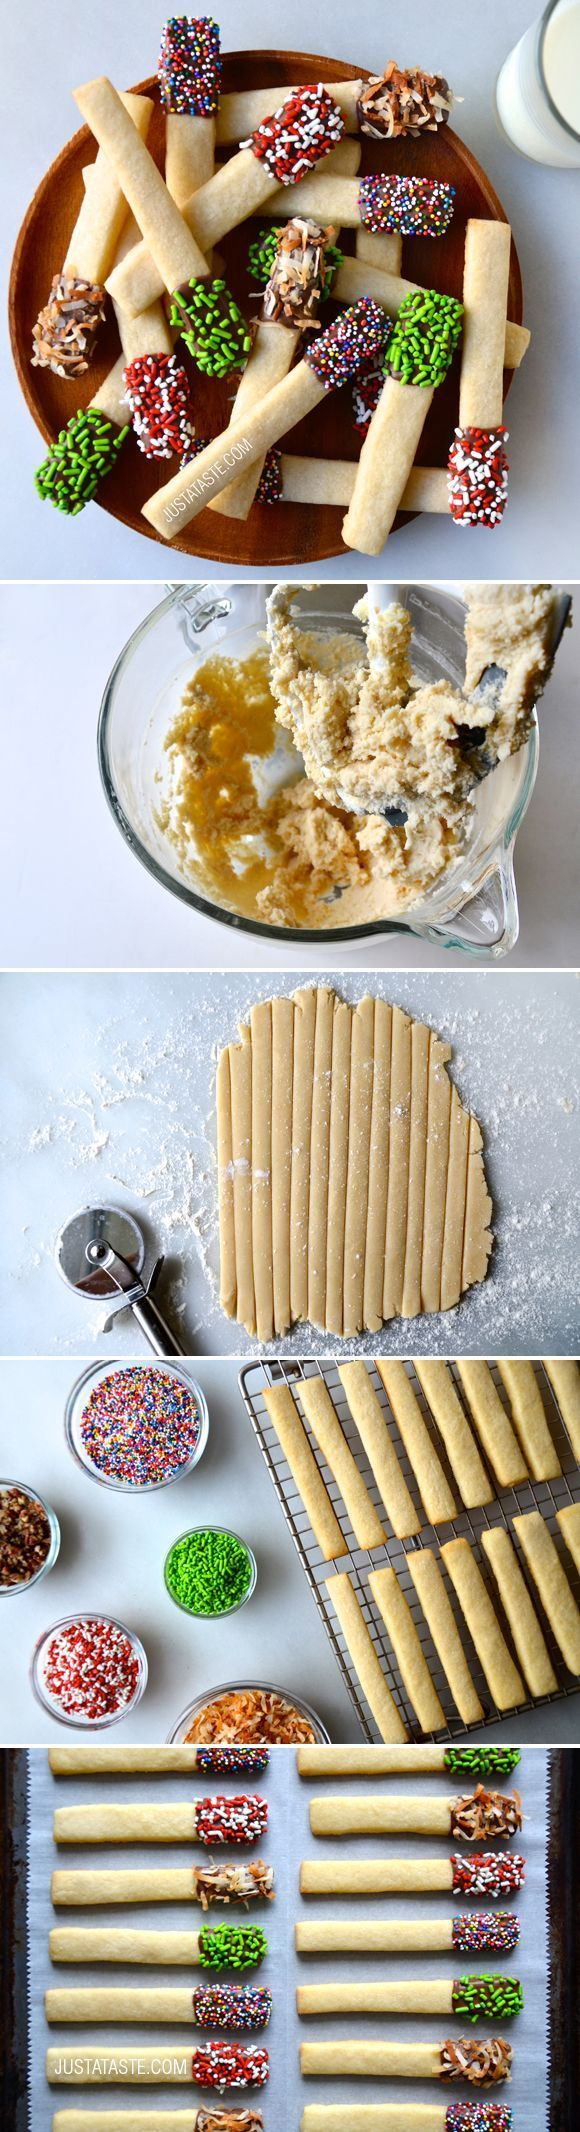 Sprinkle Sugar Cookie Sticks #recipe from justataste.com